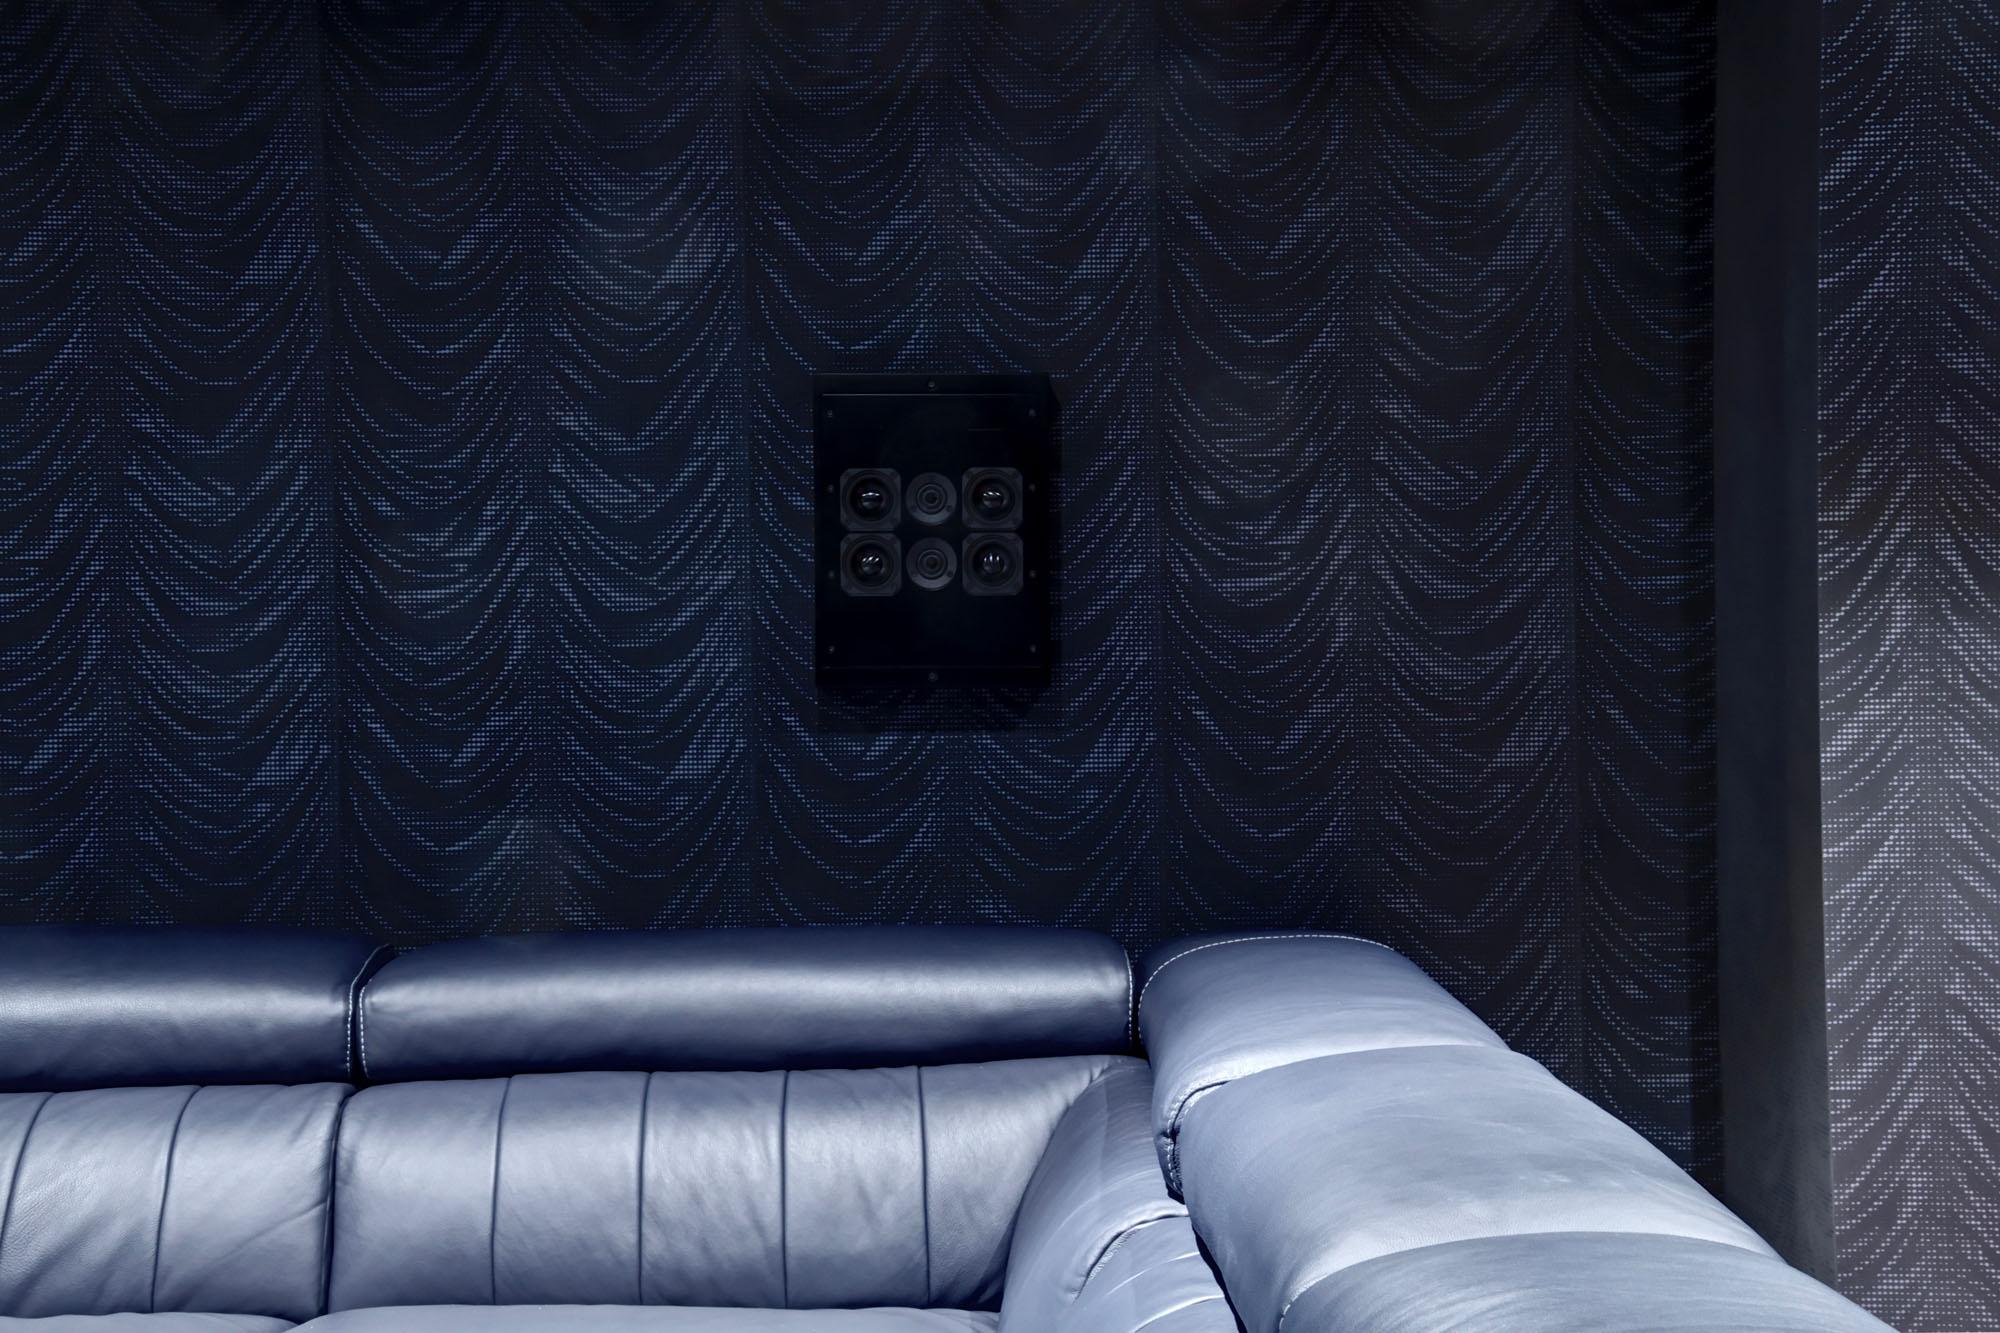 Artcoustic_Home_Cinema_Modus_Vivendi-3.jpg